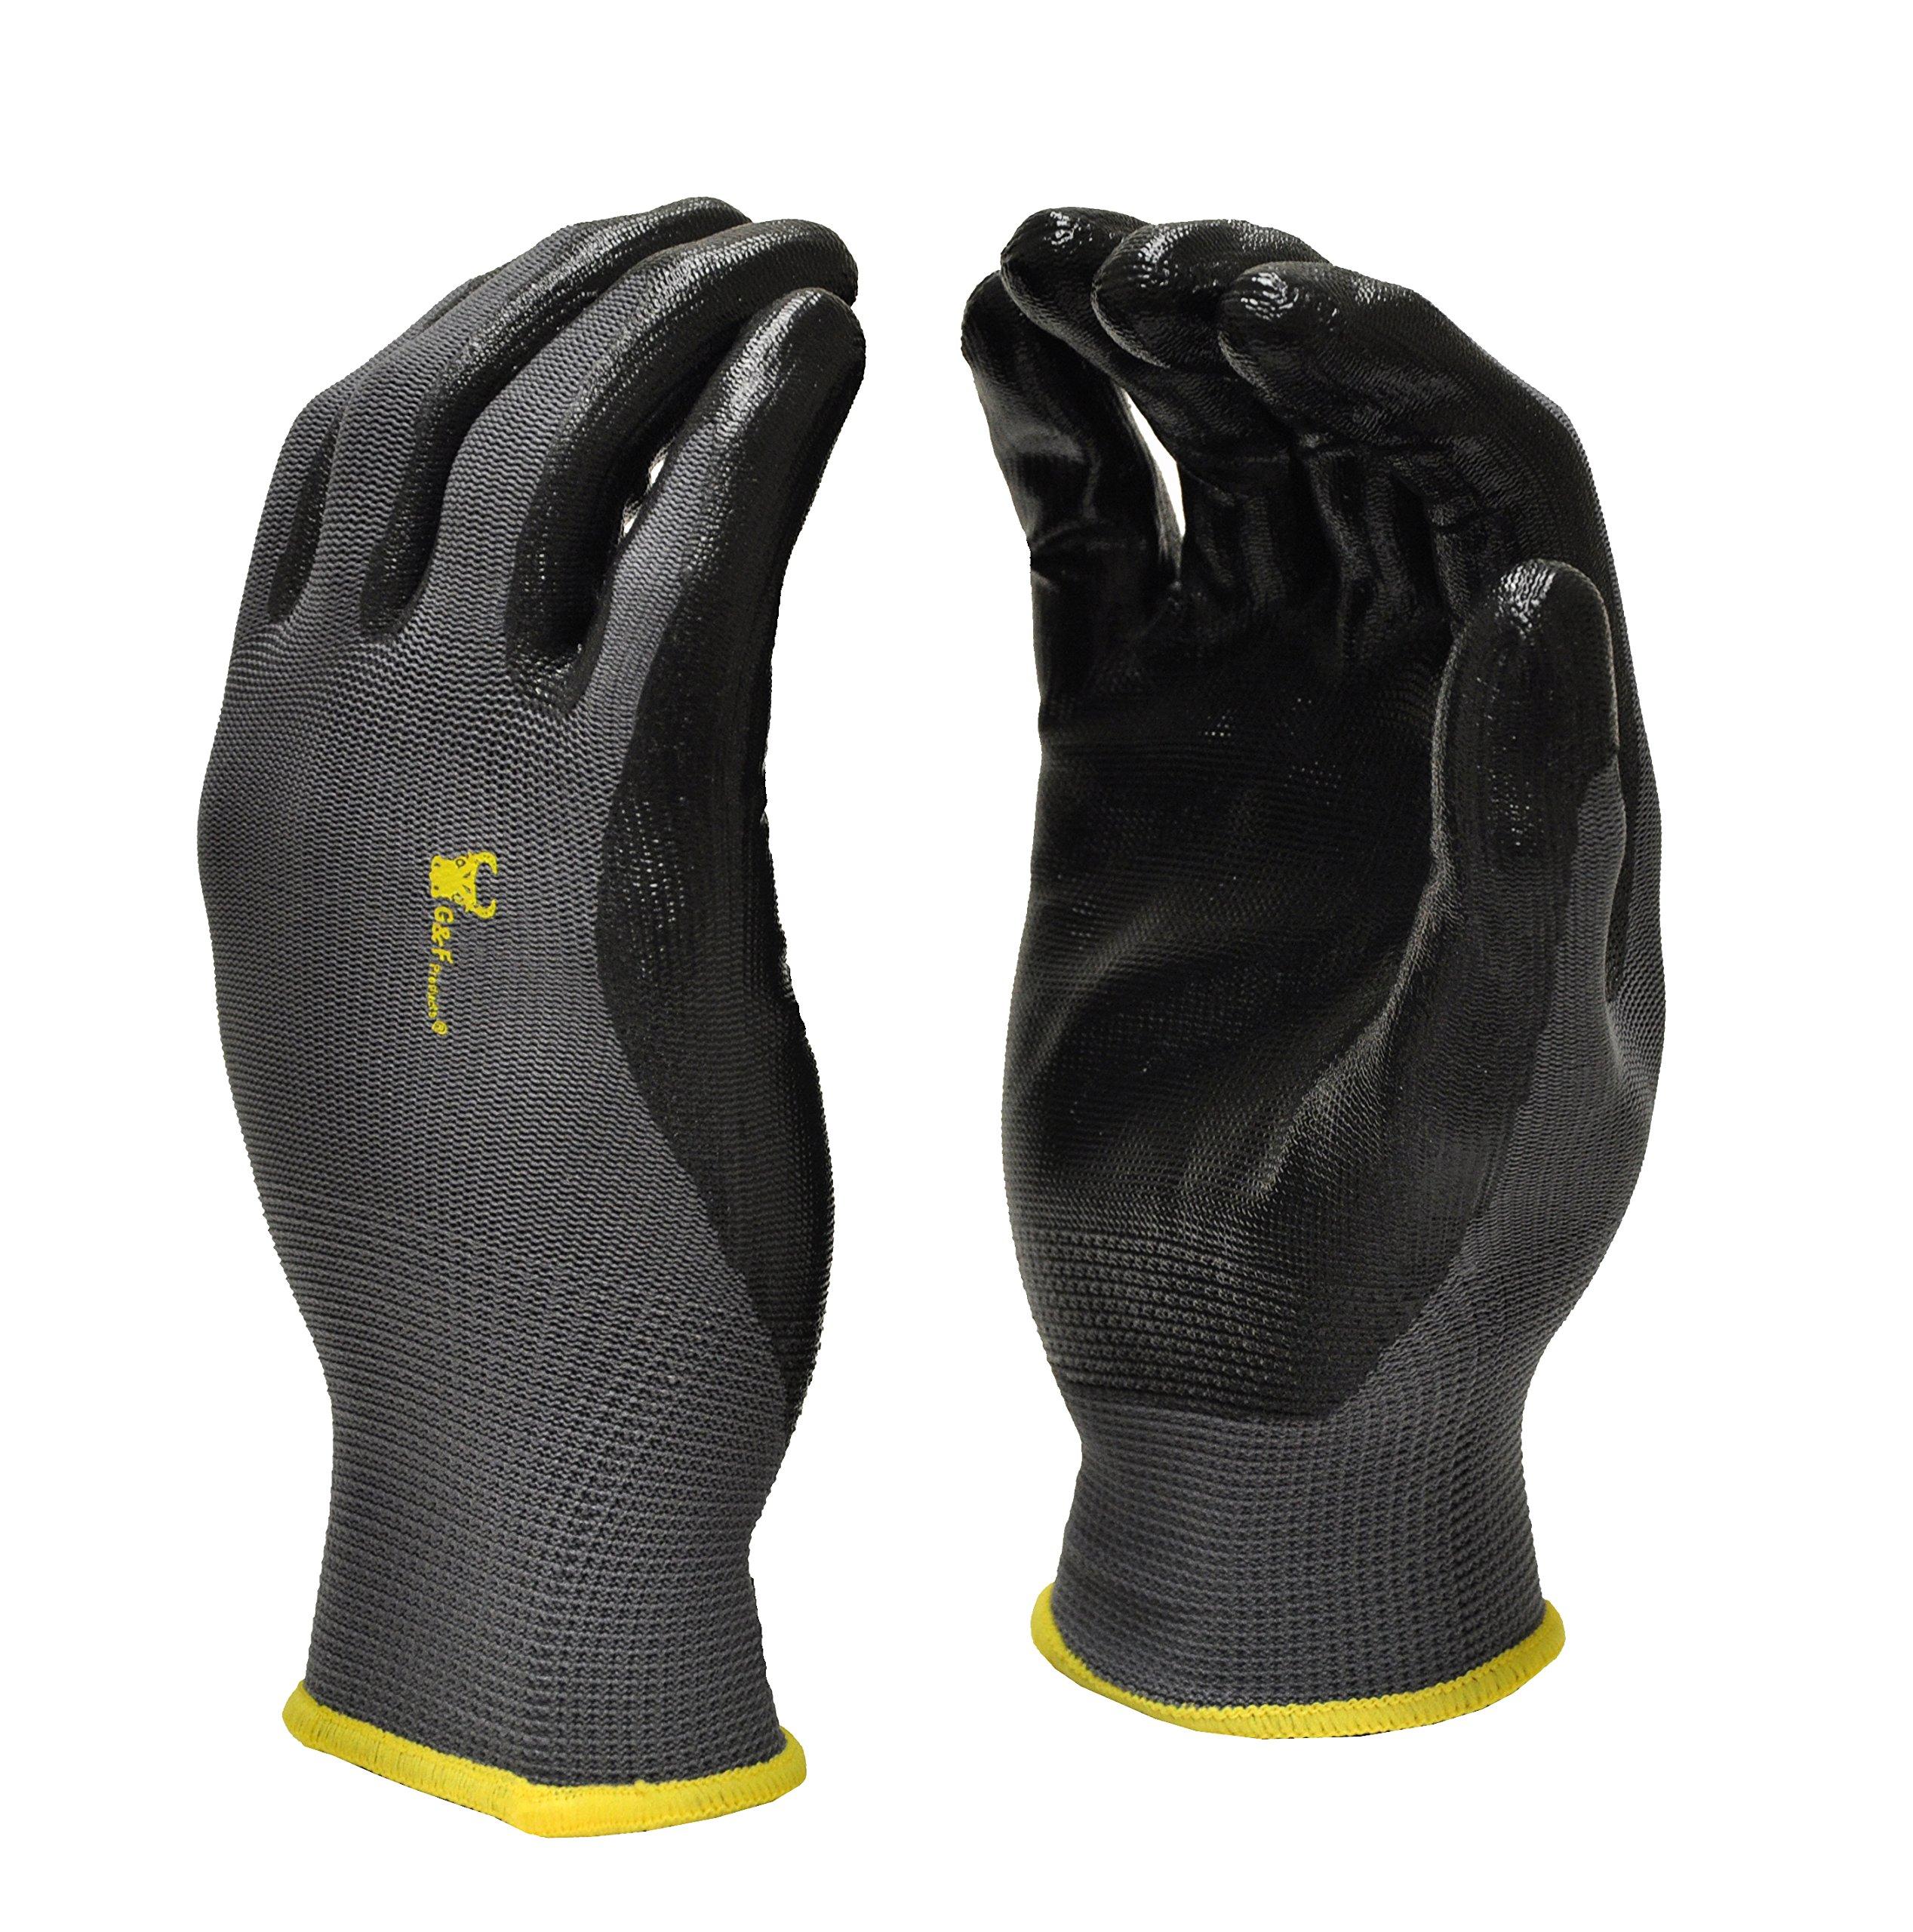 G & F 15196XL Seamless Nylon Knit Nitrile Coated Work Gloves, Garden Gloves, Black, X-Large, 6 Pair Pack